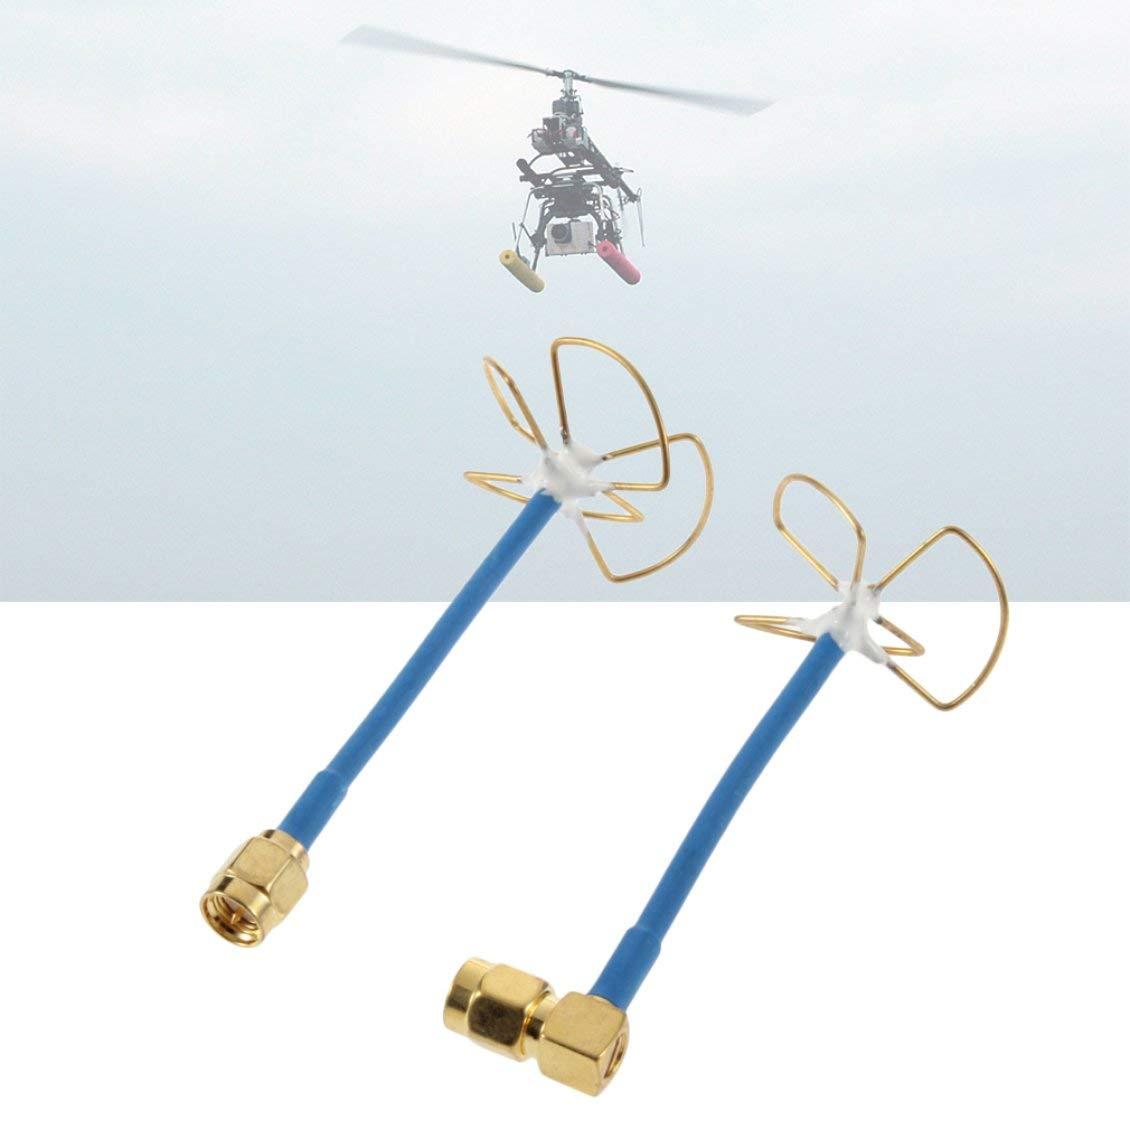 ForceSthrength 5.8G RC FPV Antena//Tr/ébol de Forma Recta Que recibe tr/ébol de Cuatro Hojas